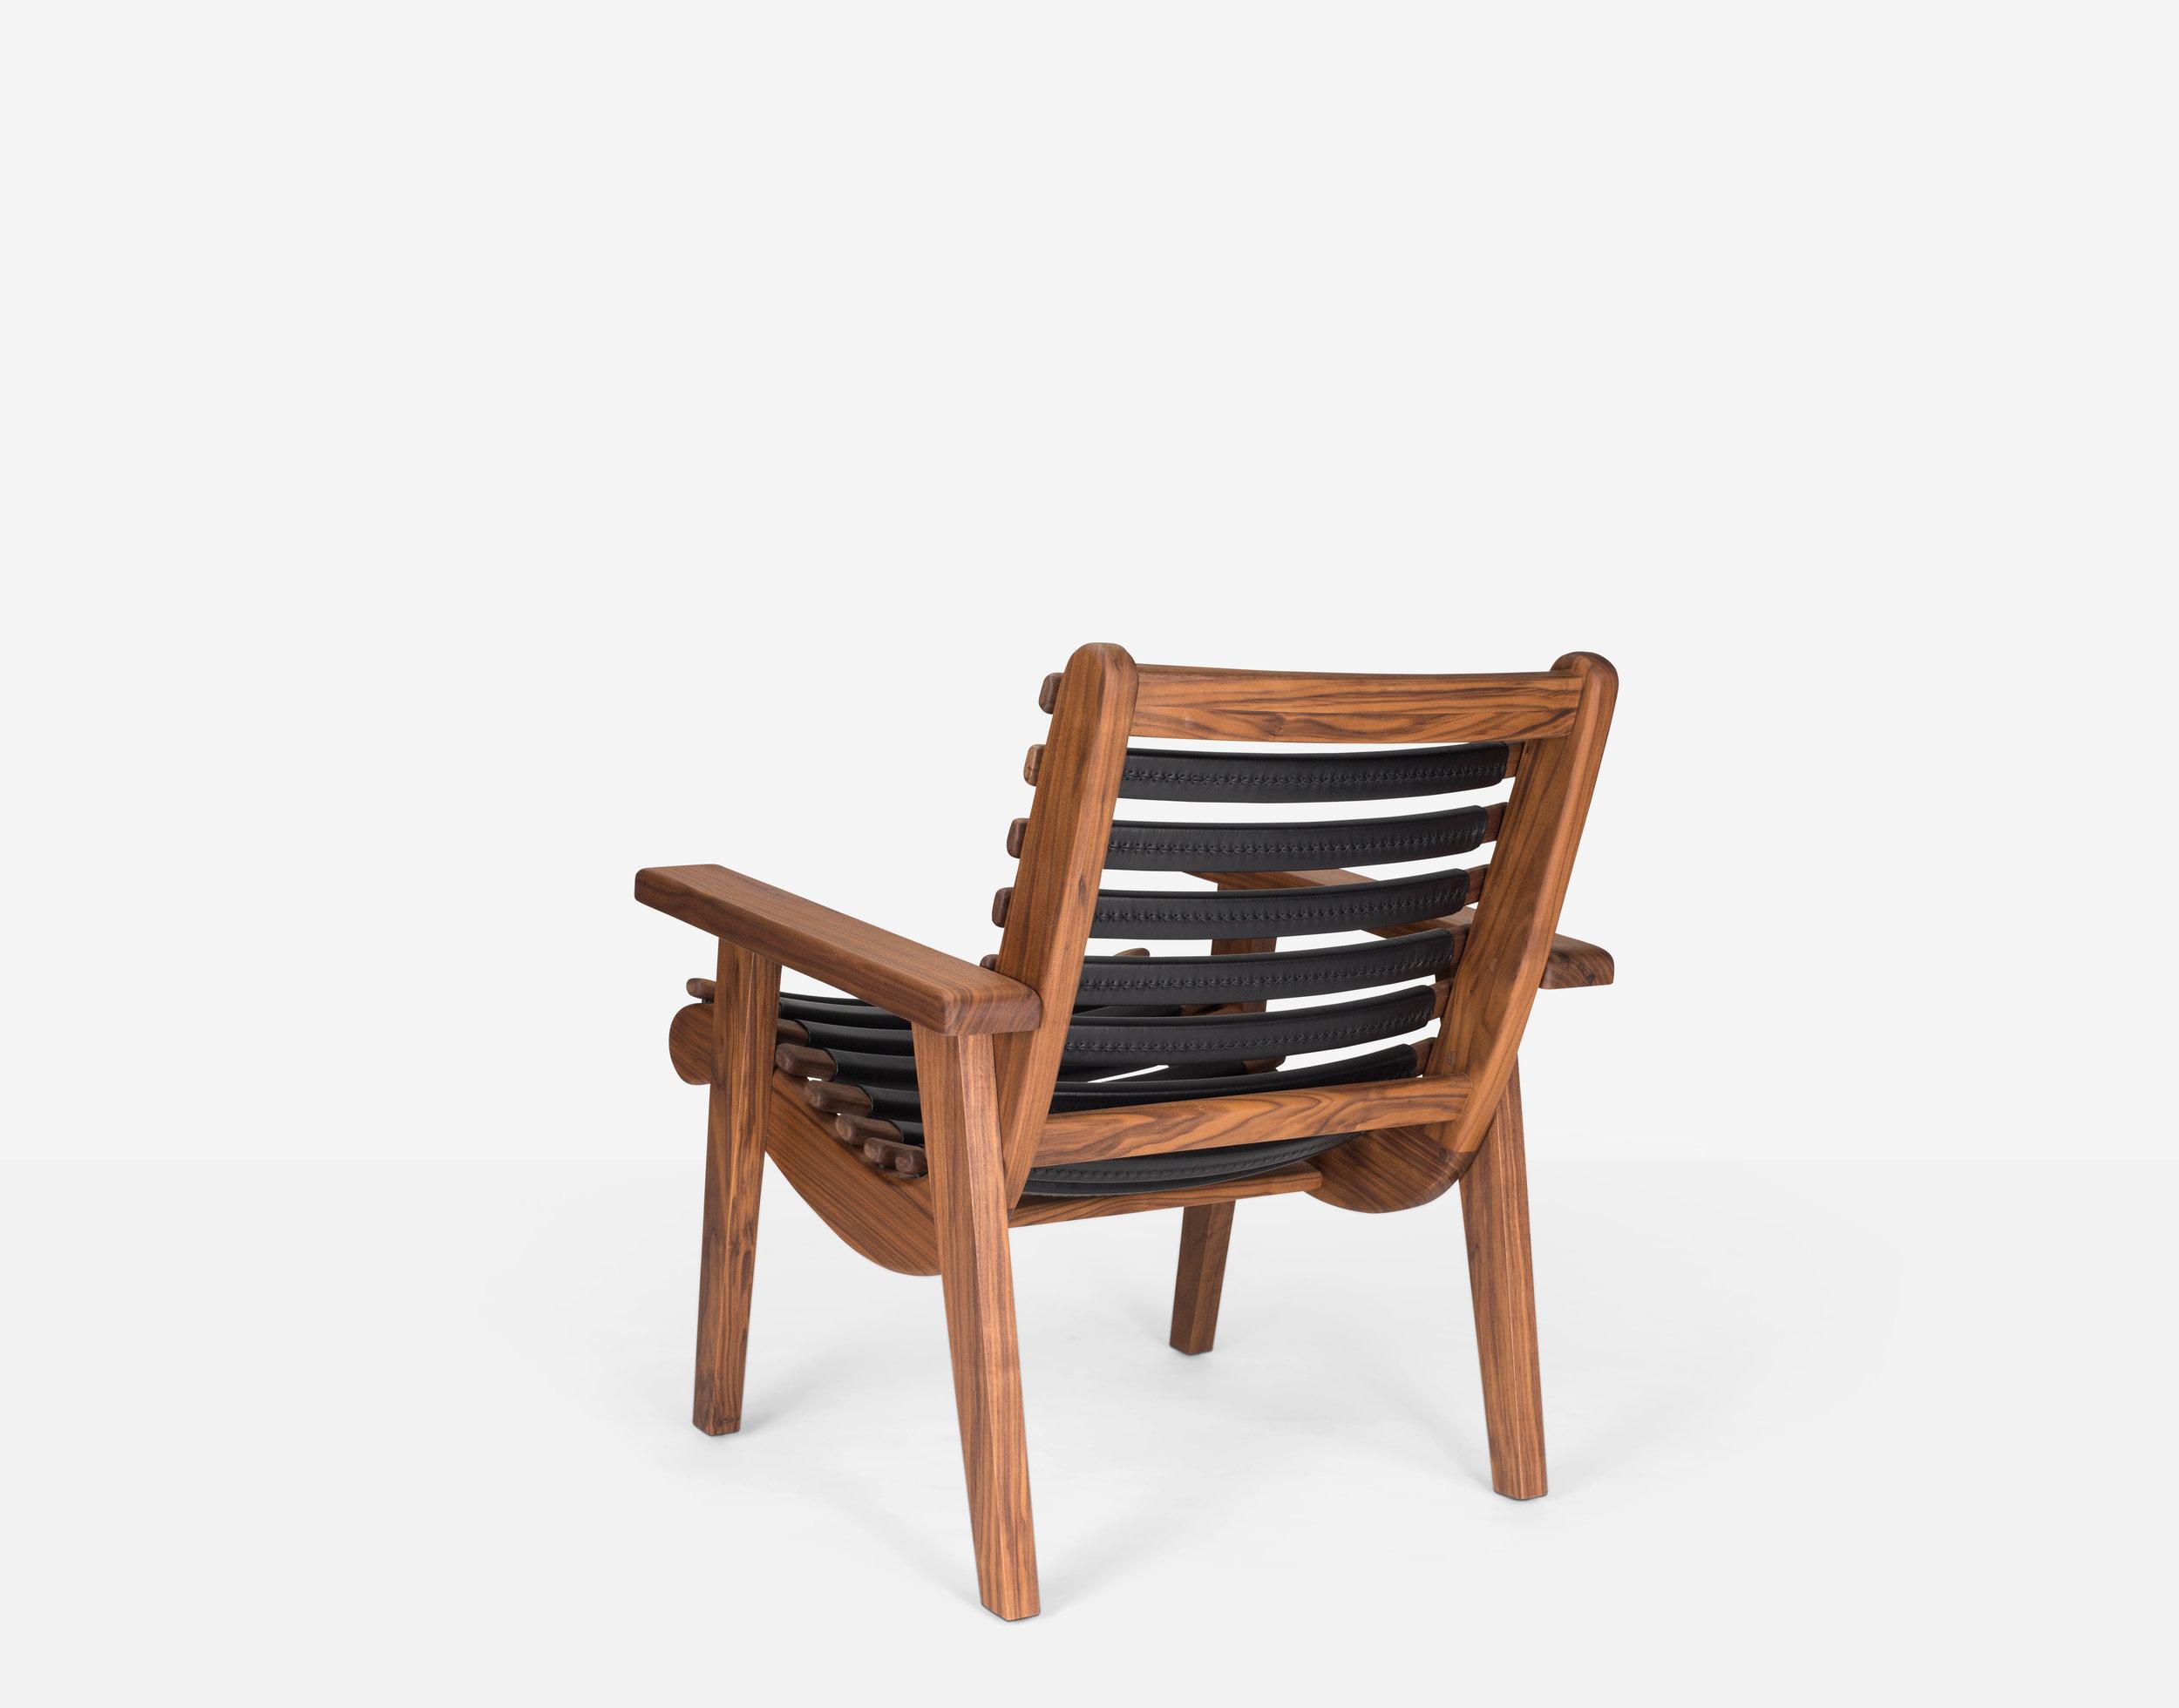 Luteca_MvB_San Miguelito-Armchair_Black-Leather_Walnut_BP-W.jpg